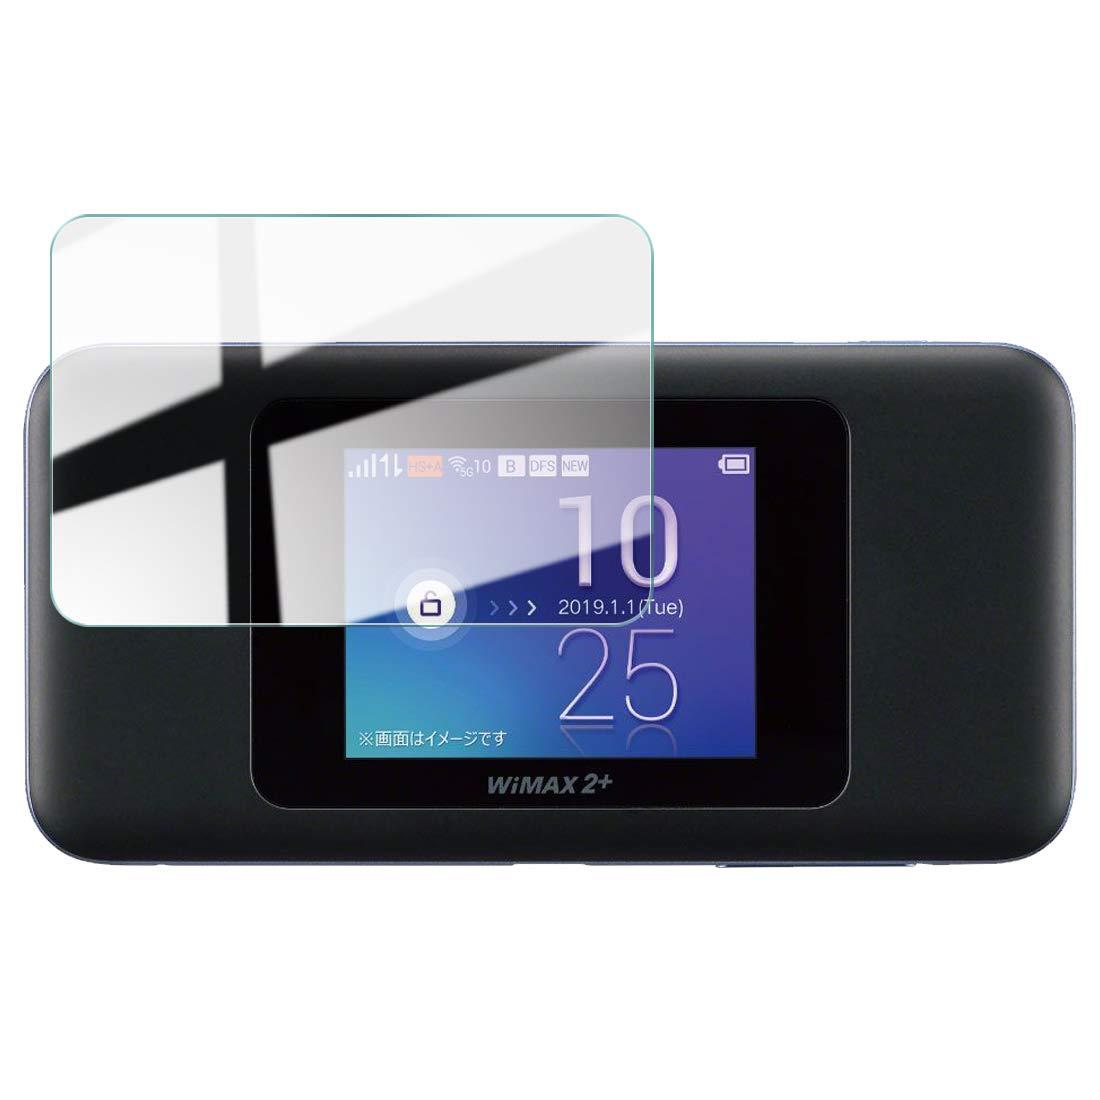 UQ W06 Speed Wi-Fi NEXT 国産ガラス使用 ガラスフィルム 強化ガラス 最高硬度9H 指紋防止 0.3mm ラウンドエッジ 液晶保護フィルム simフリー スマートフォン【WANLOK】W06 369